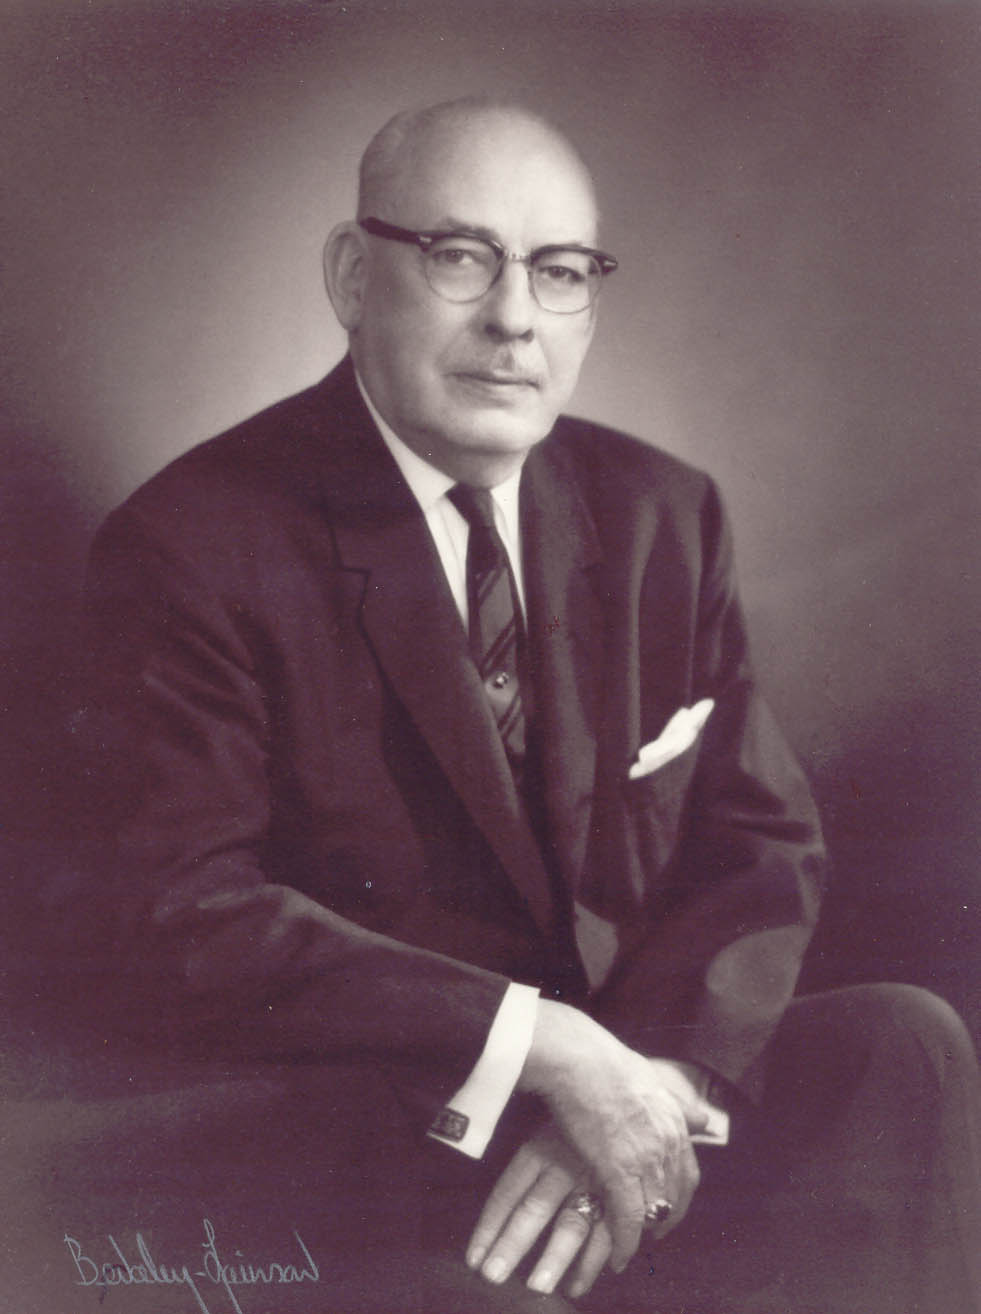 Mr. R.J. Tipton